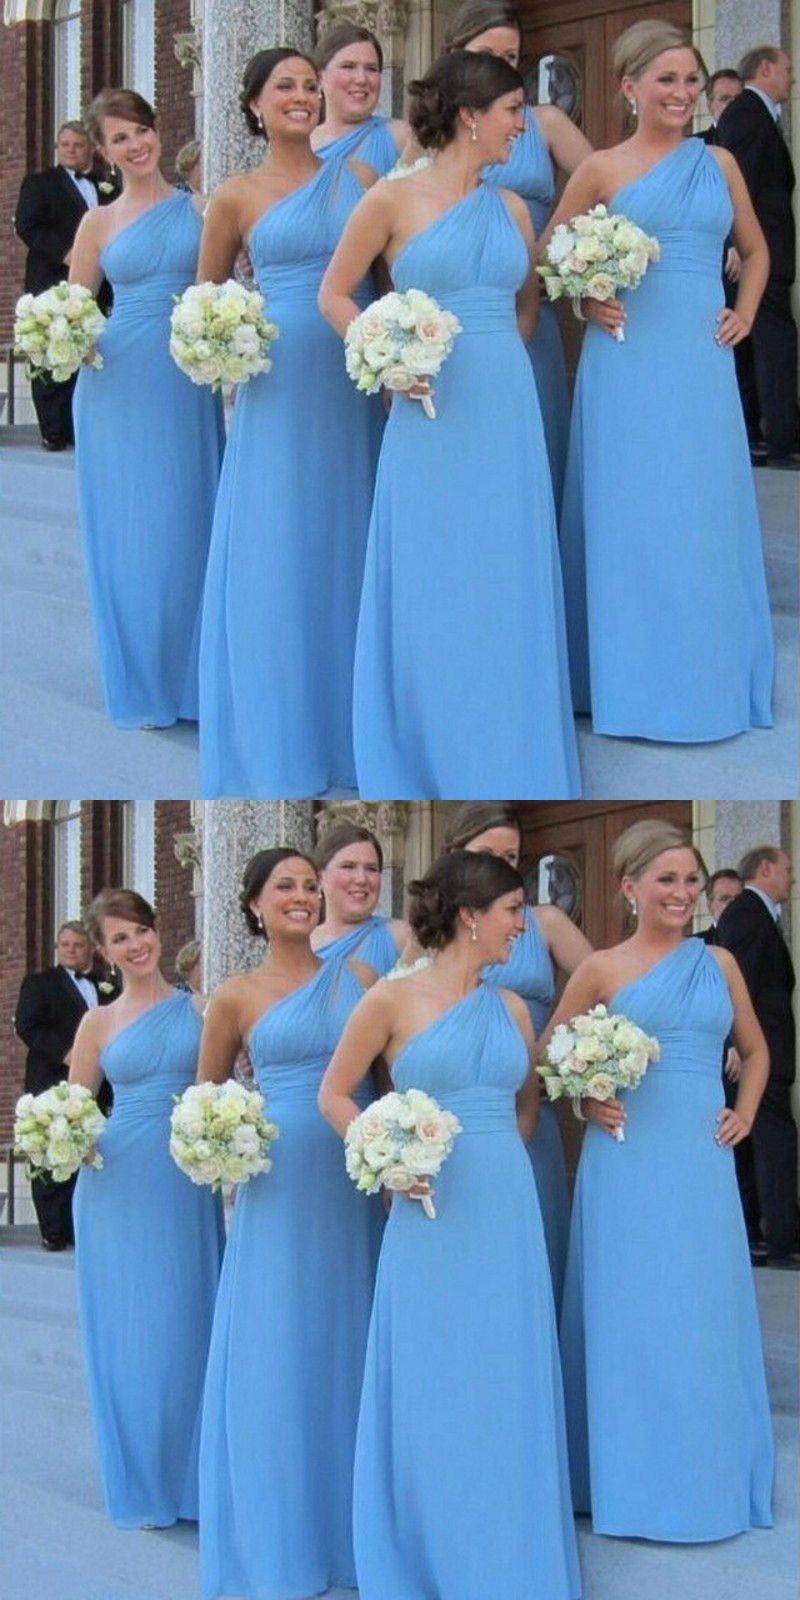 f54a1307d7d Simple One Shoulder Floor Length Sky Blue Bridesmaid Dress in 2019 ...